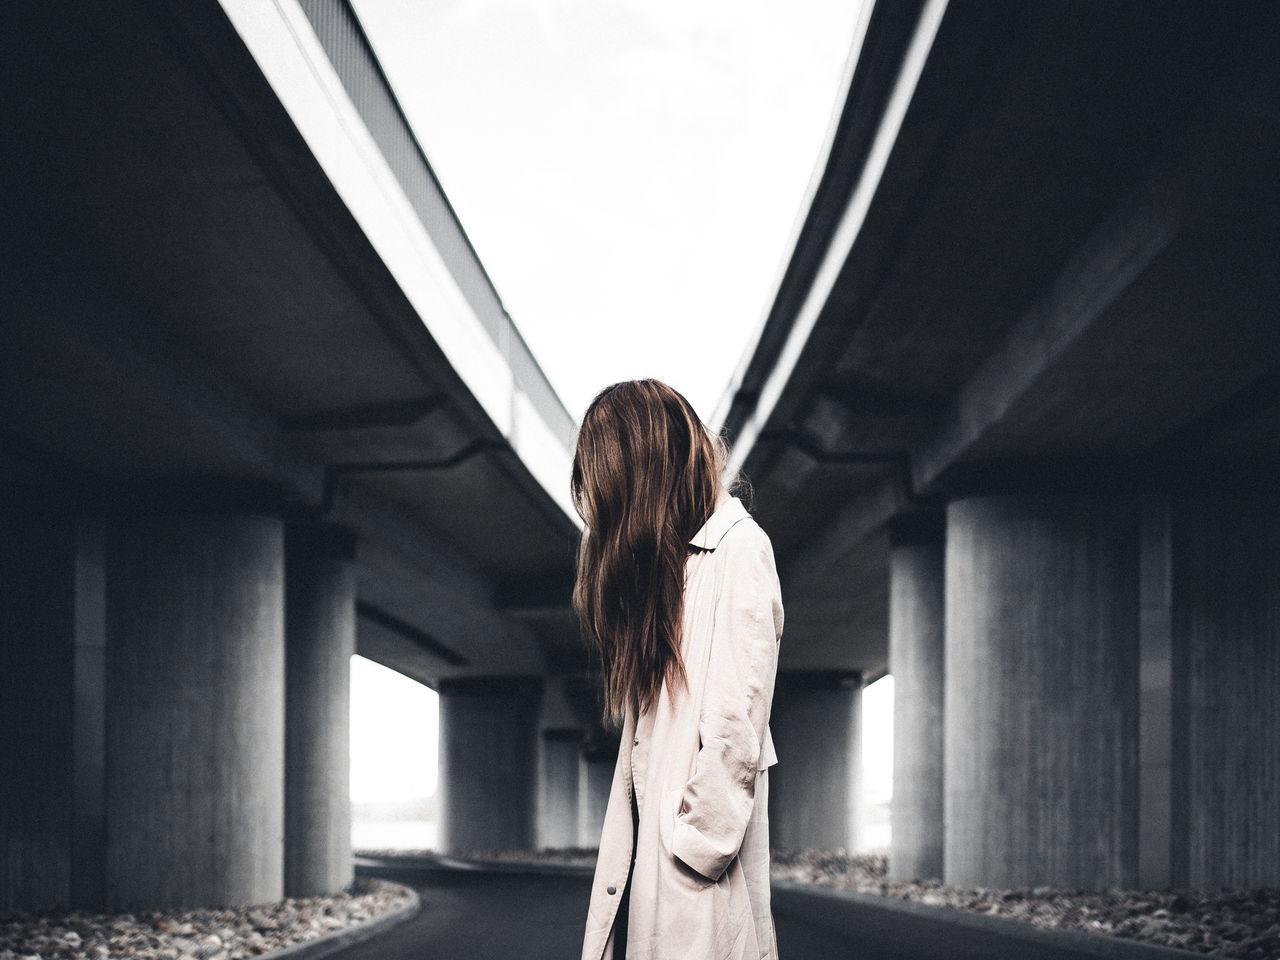 Side View Of Woman Standing In Corridor